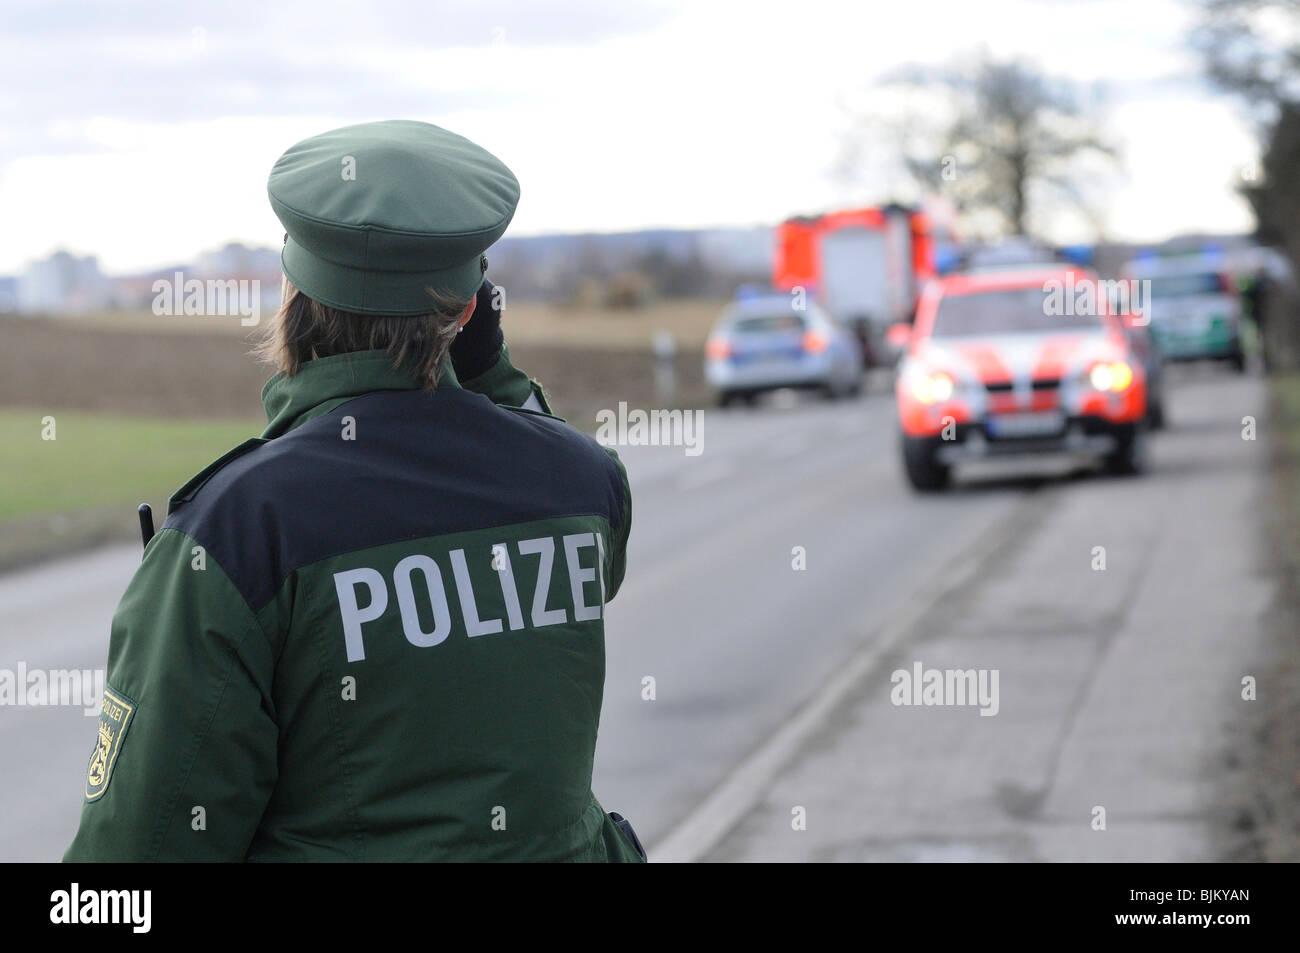 Police officer on duty location, Stuttgart, Baden-Wuerttemberg, Germany, Europe Stock Photo